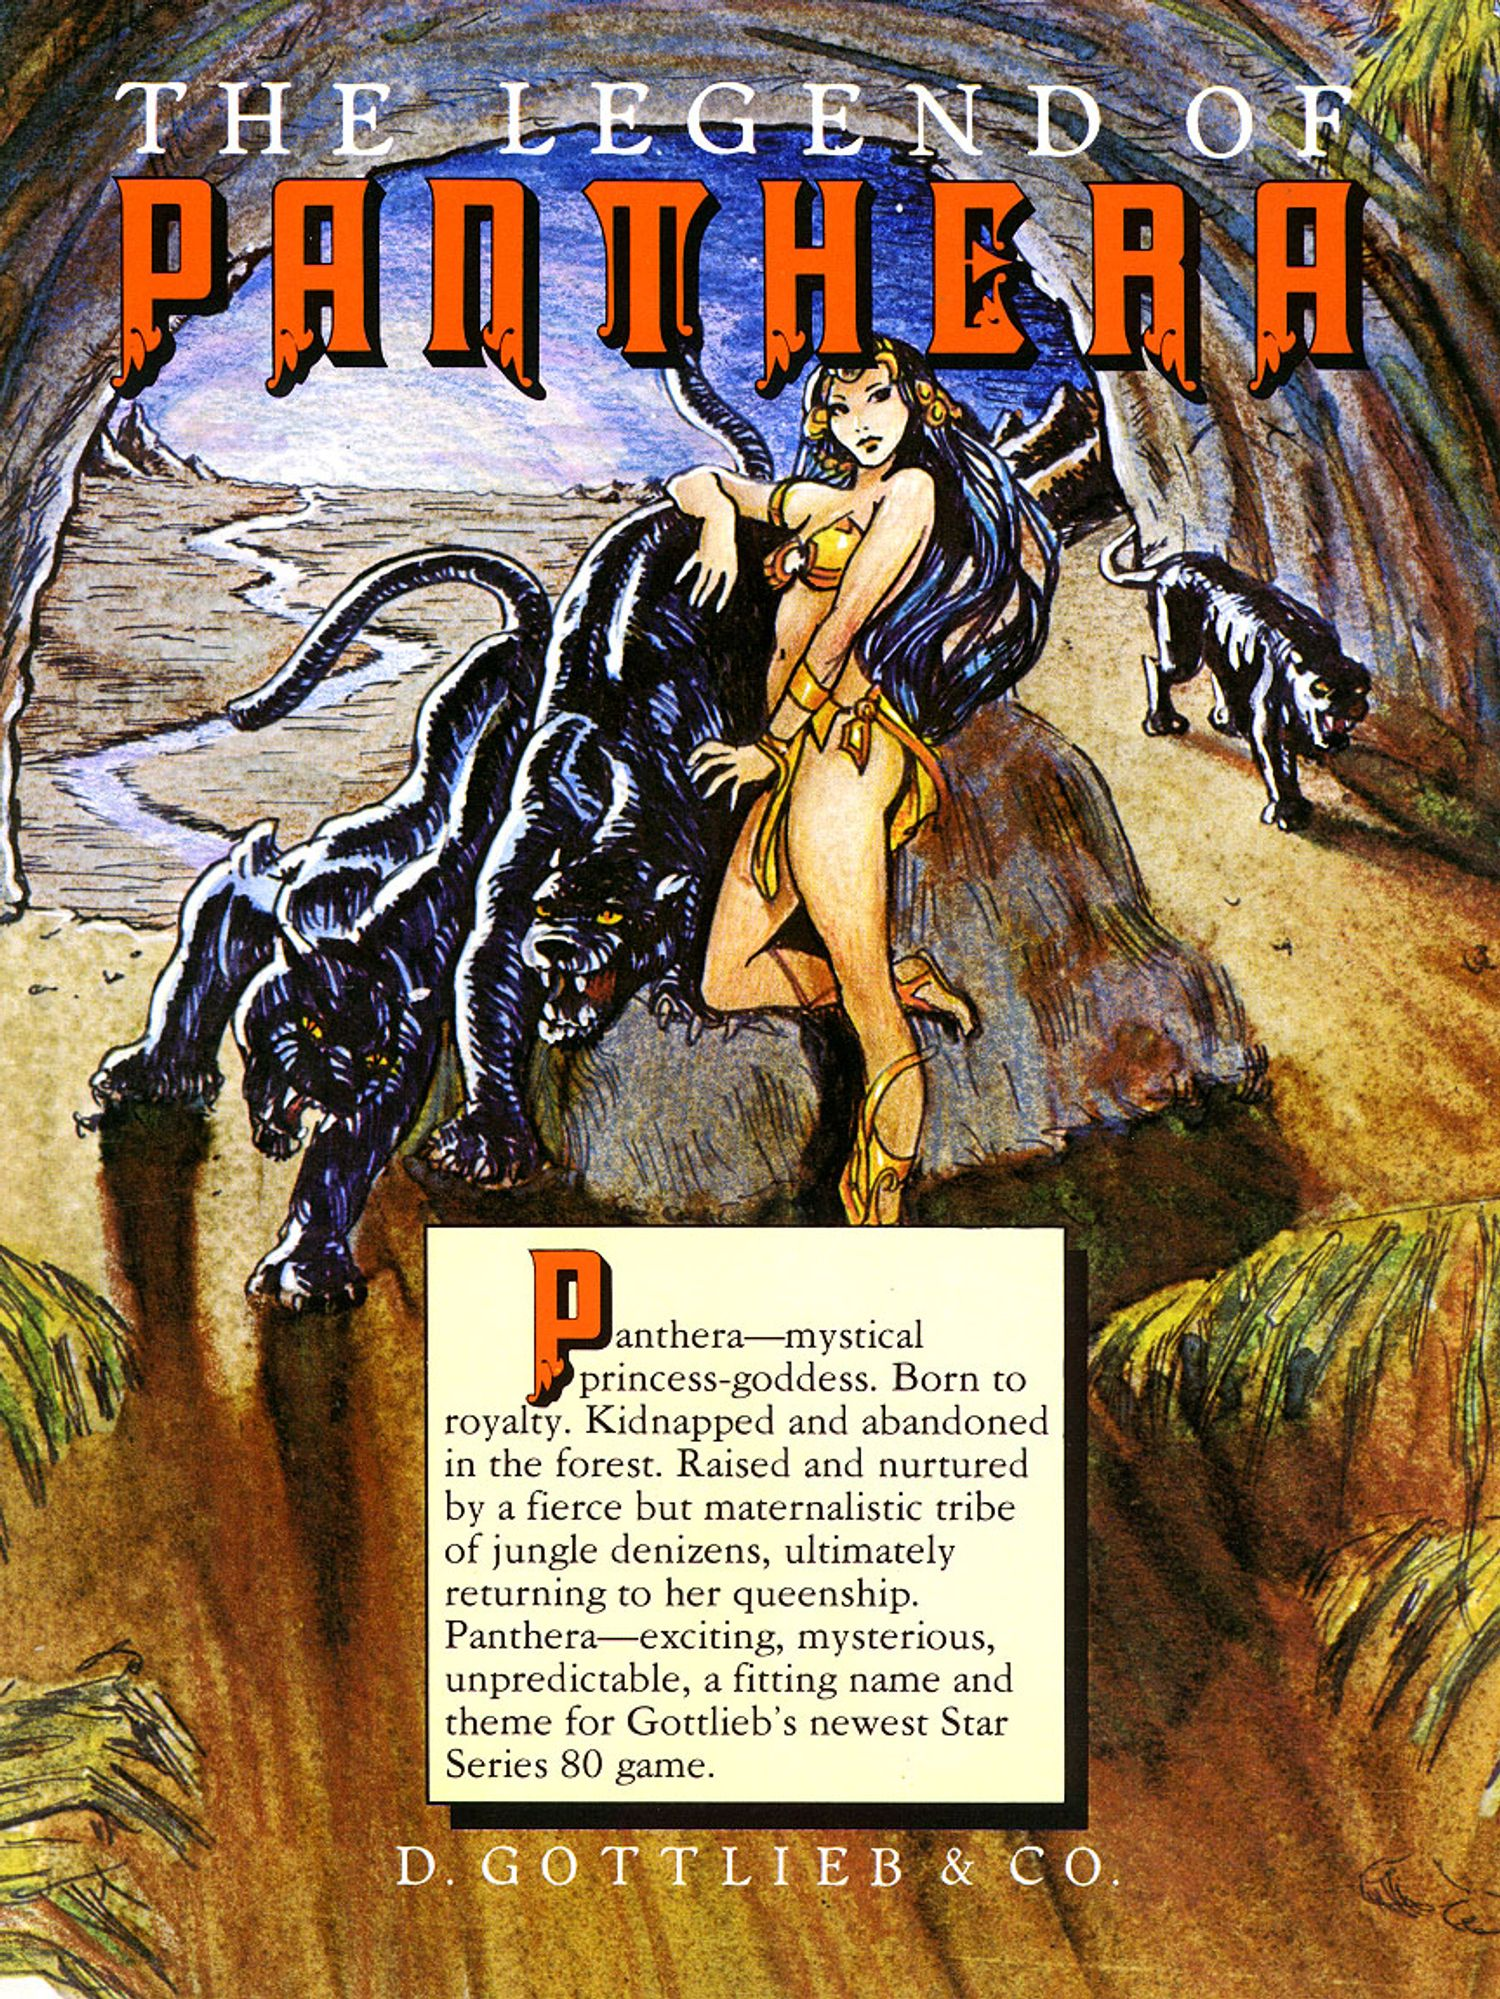 Panthera Flyer front